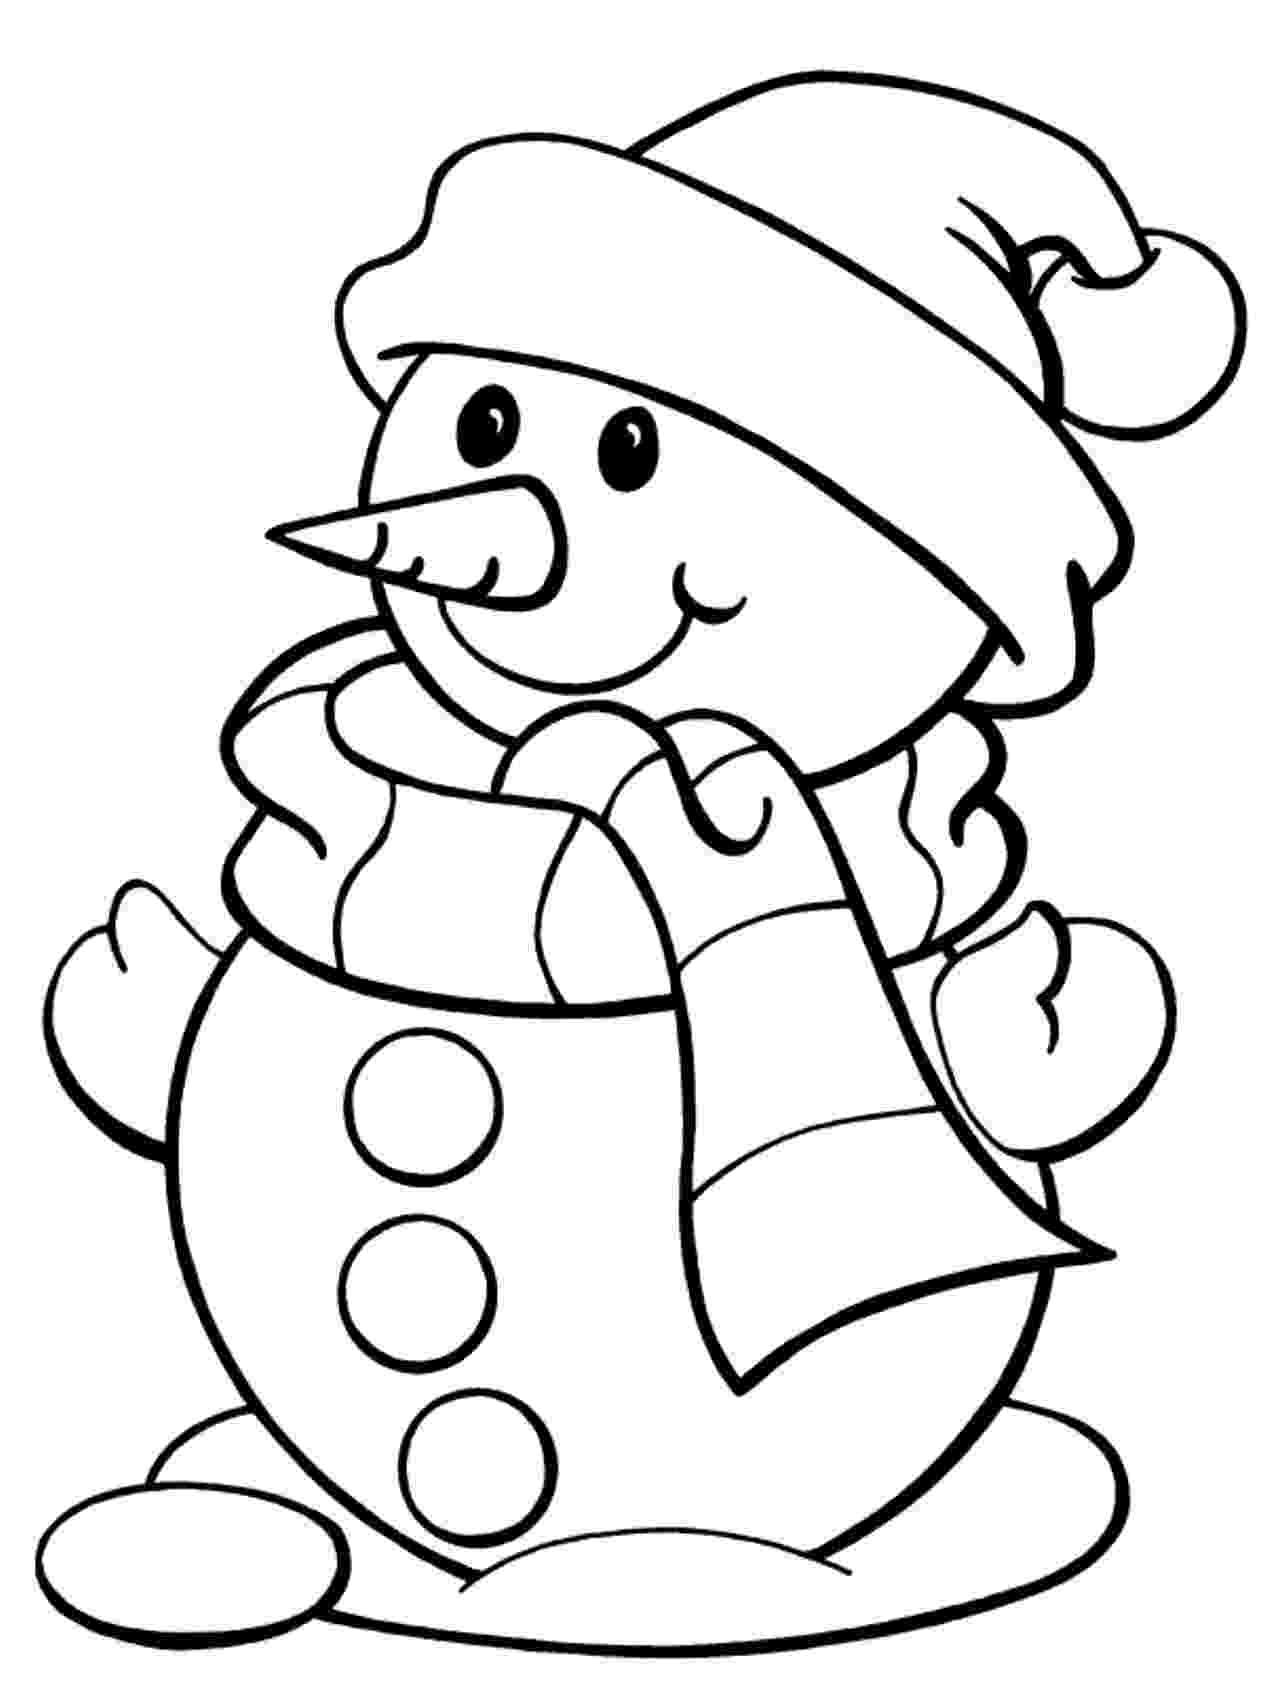 winter coloring book free printable winter coloring pages for kids book coloring winter